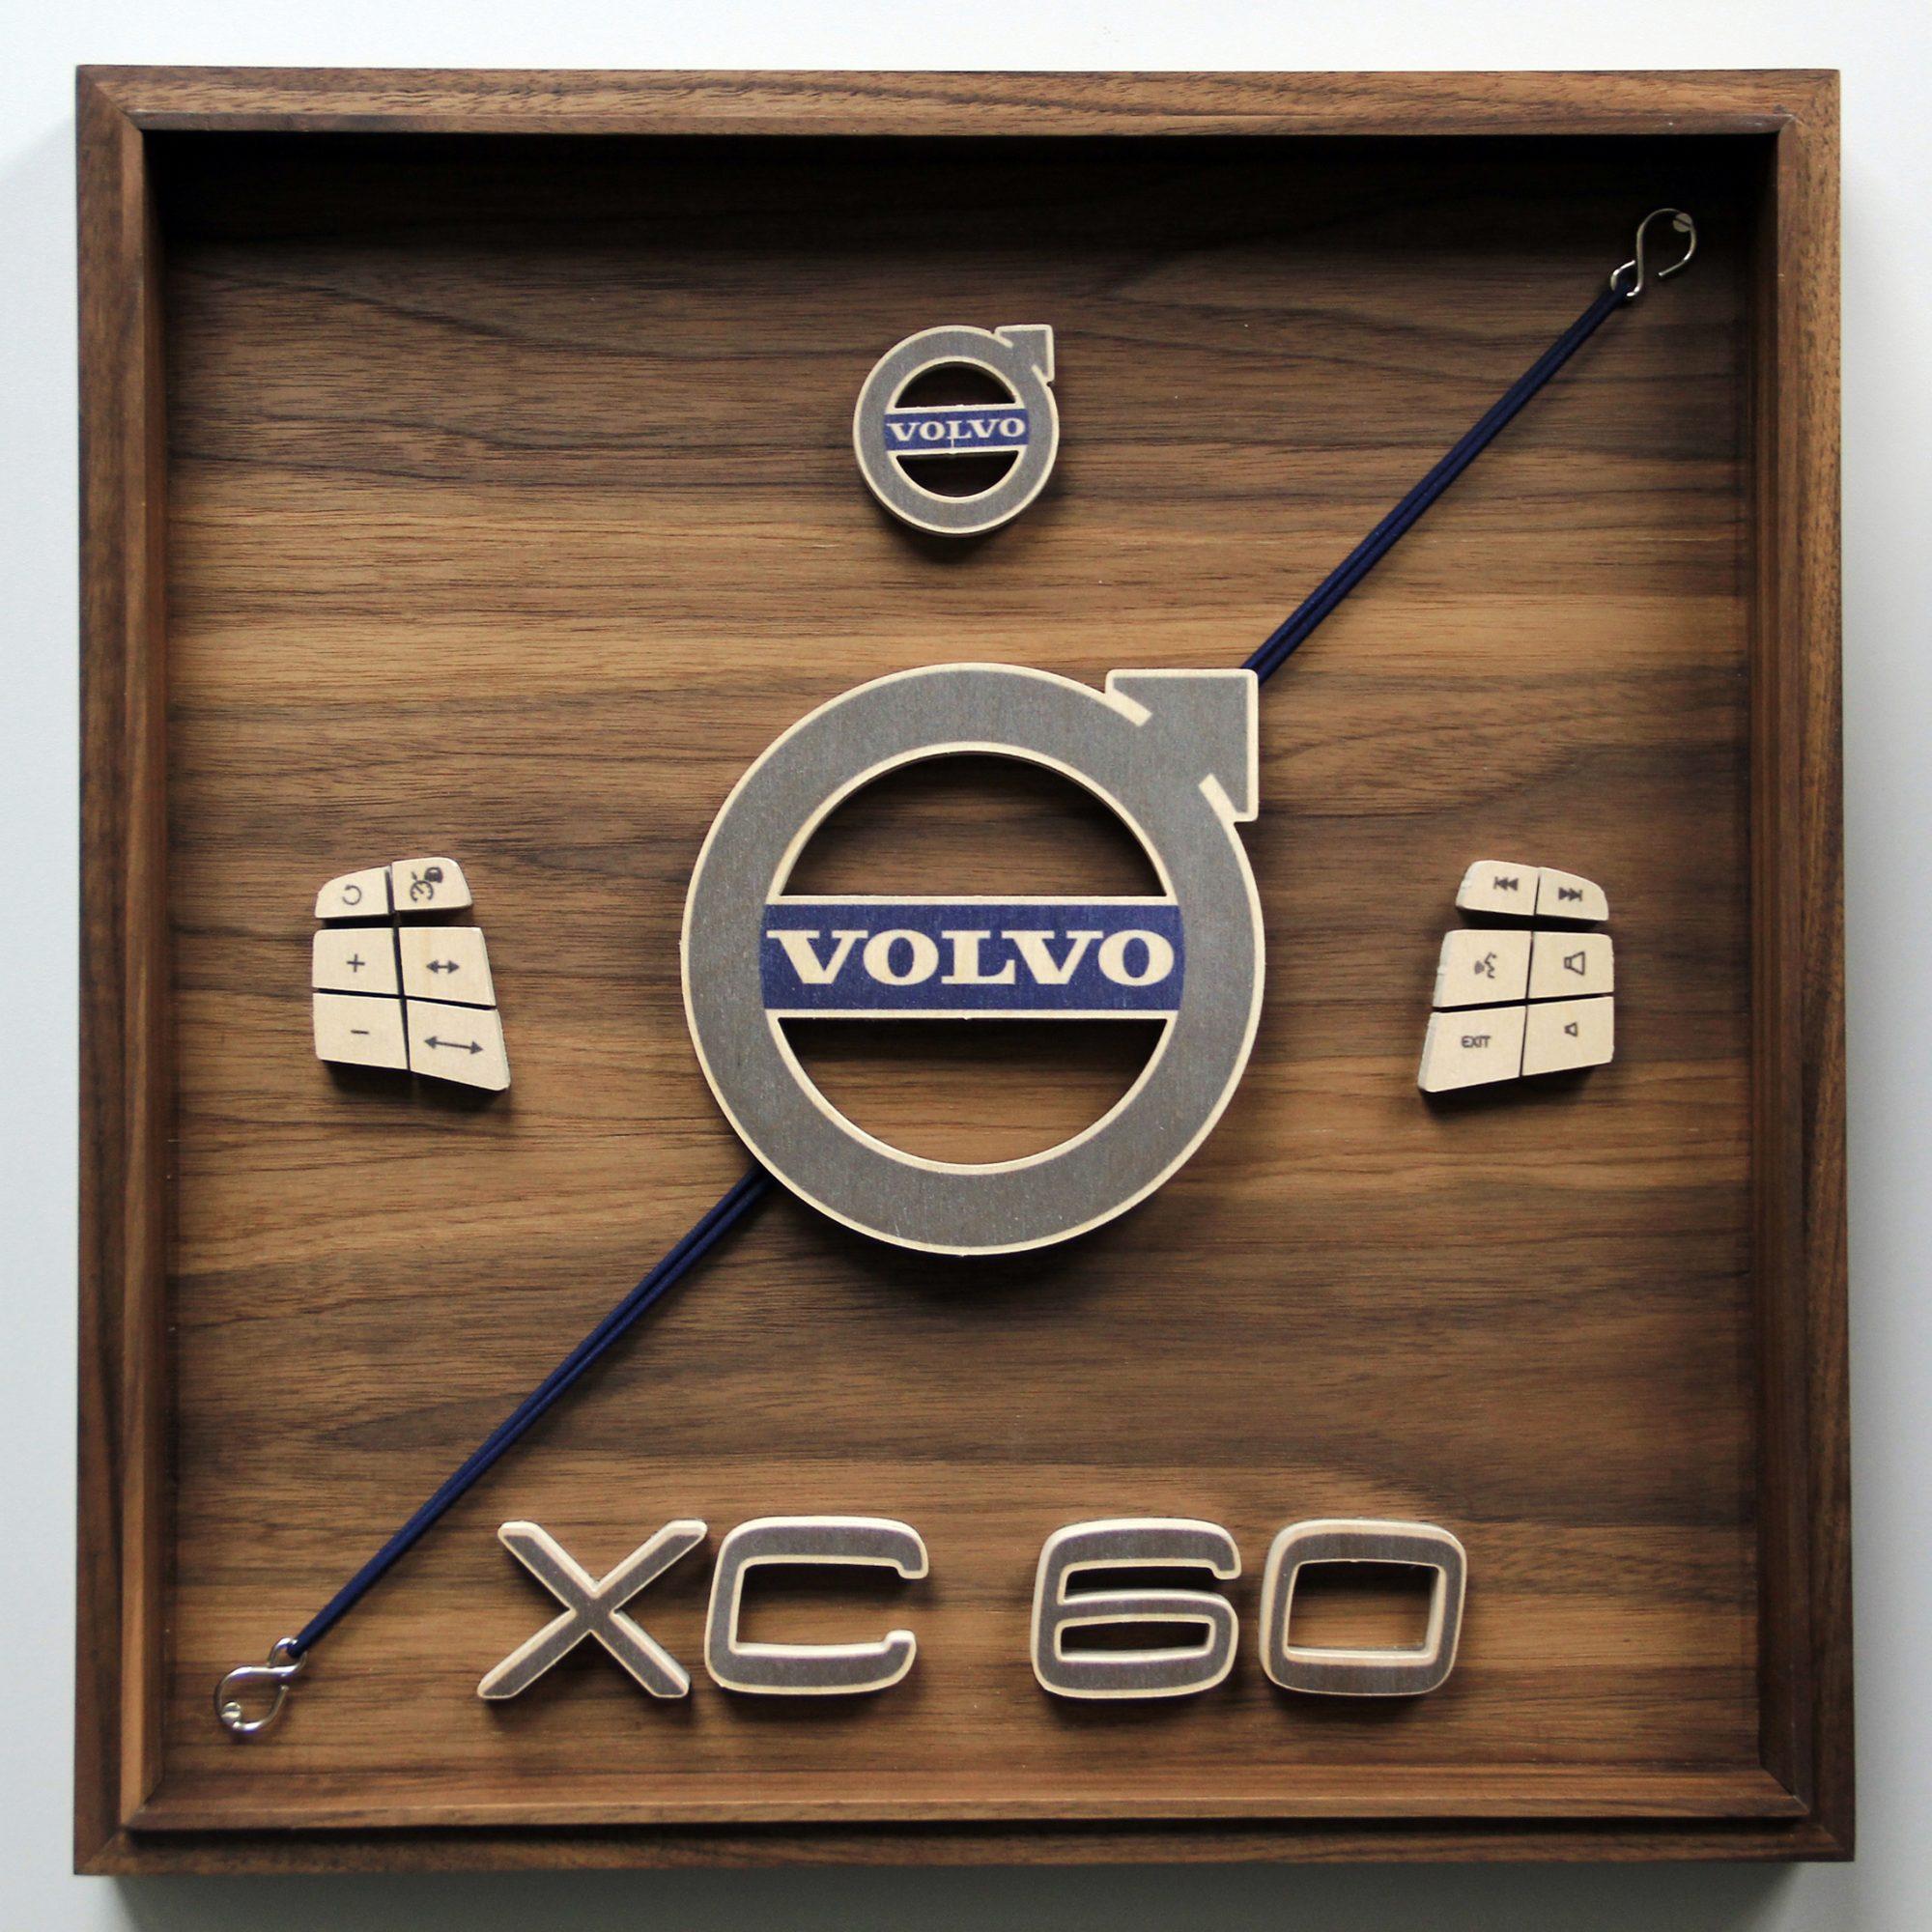 Volvo Design Contest